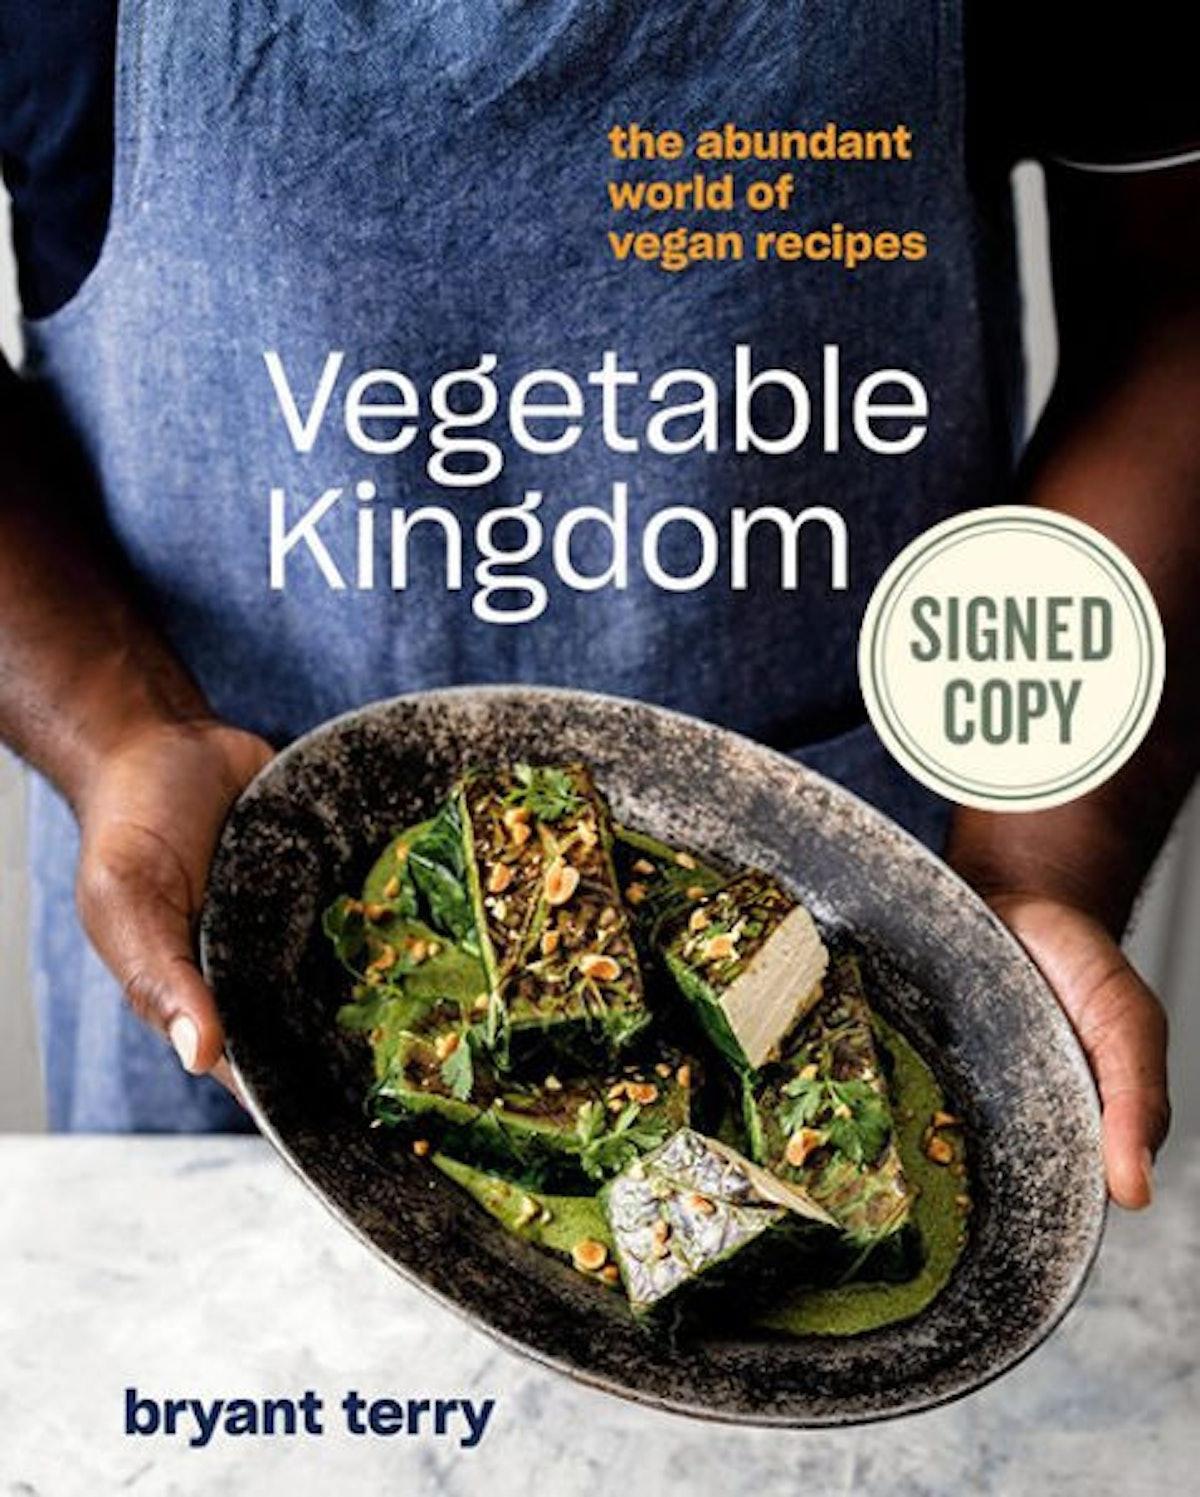 'Vegetable Kingdom: The Abundant World of Vegan Recipes' by Bryant Terry